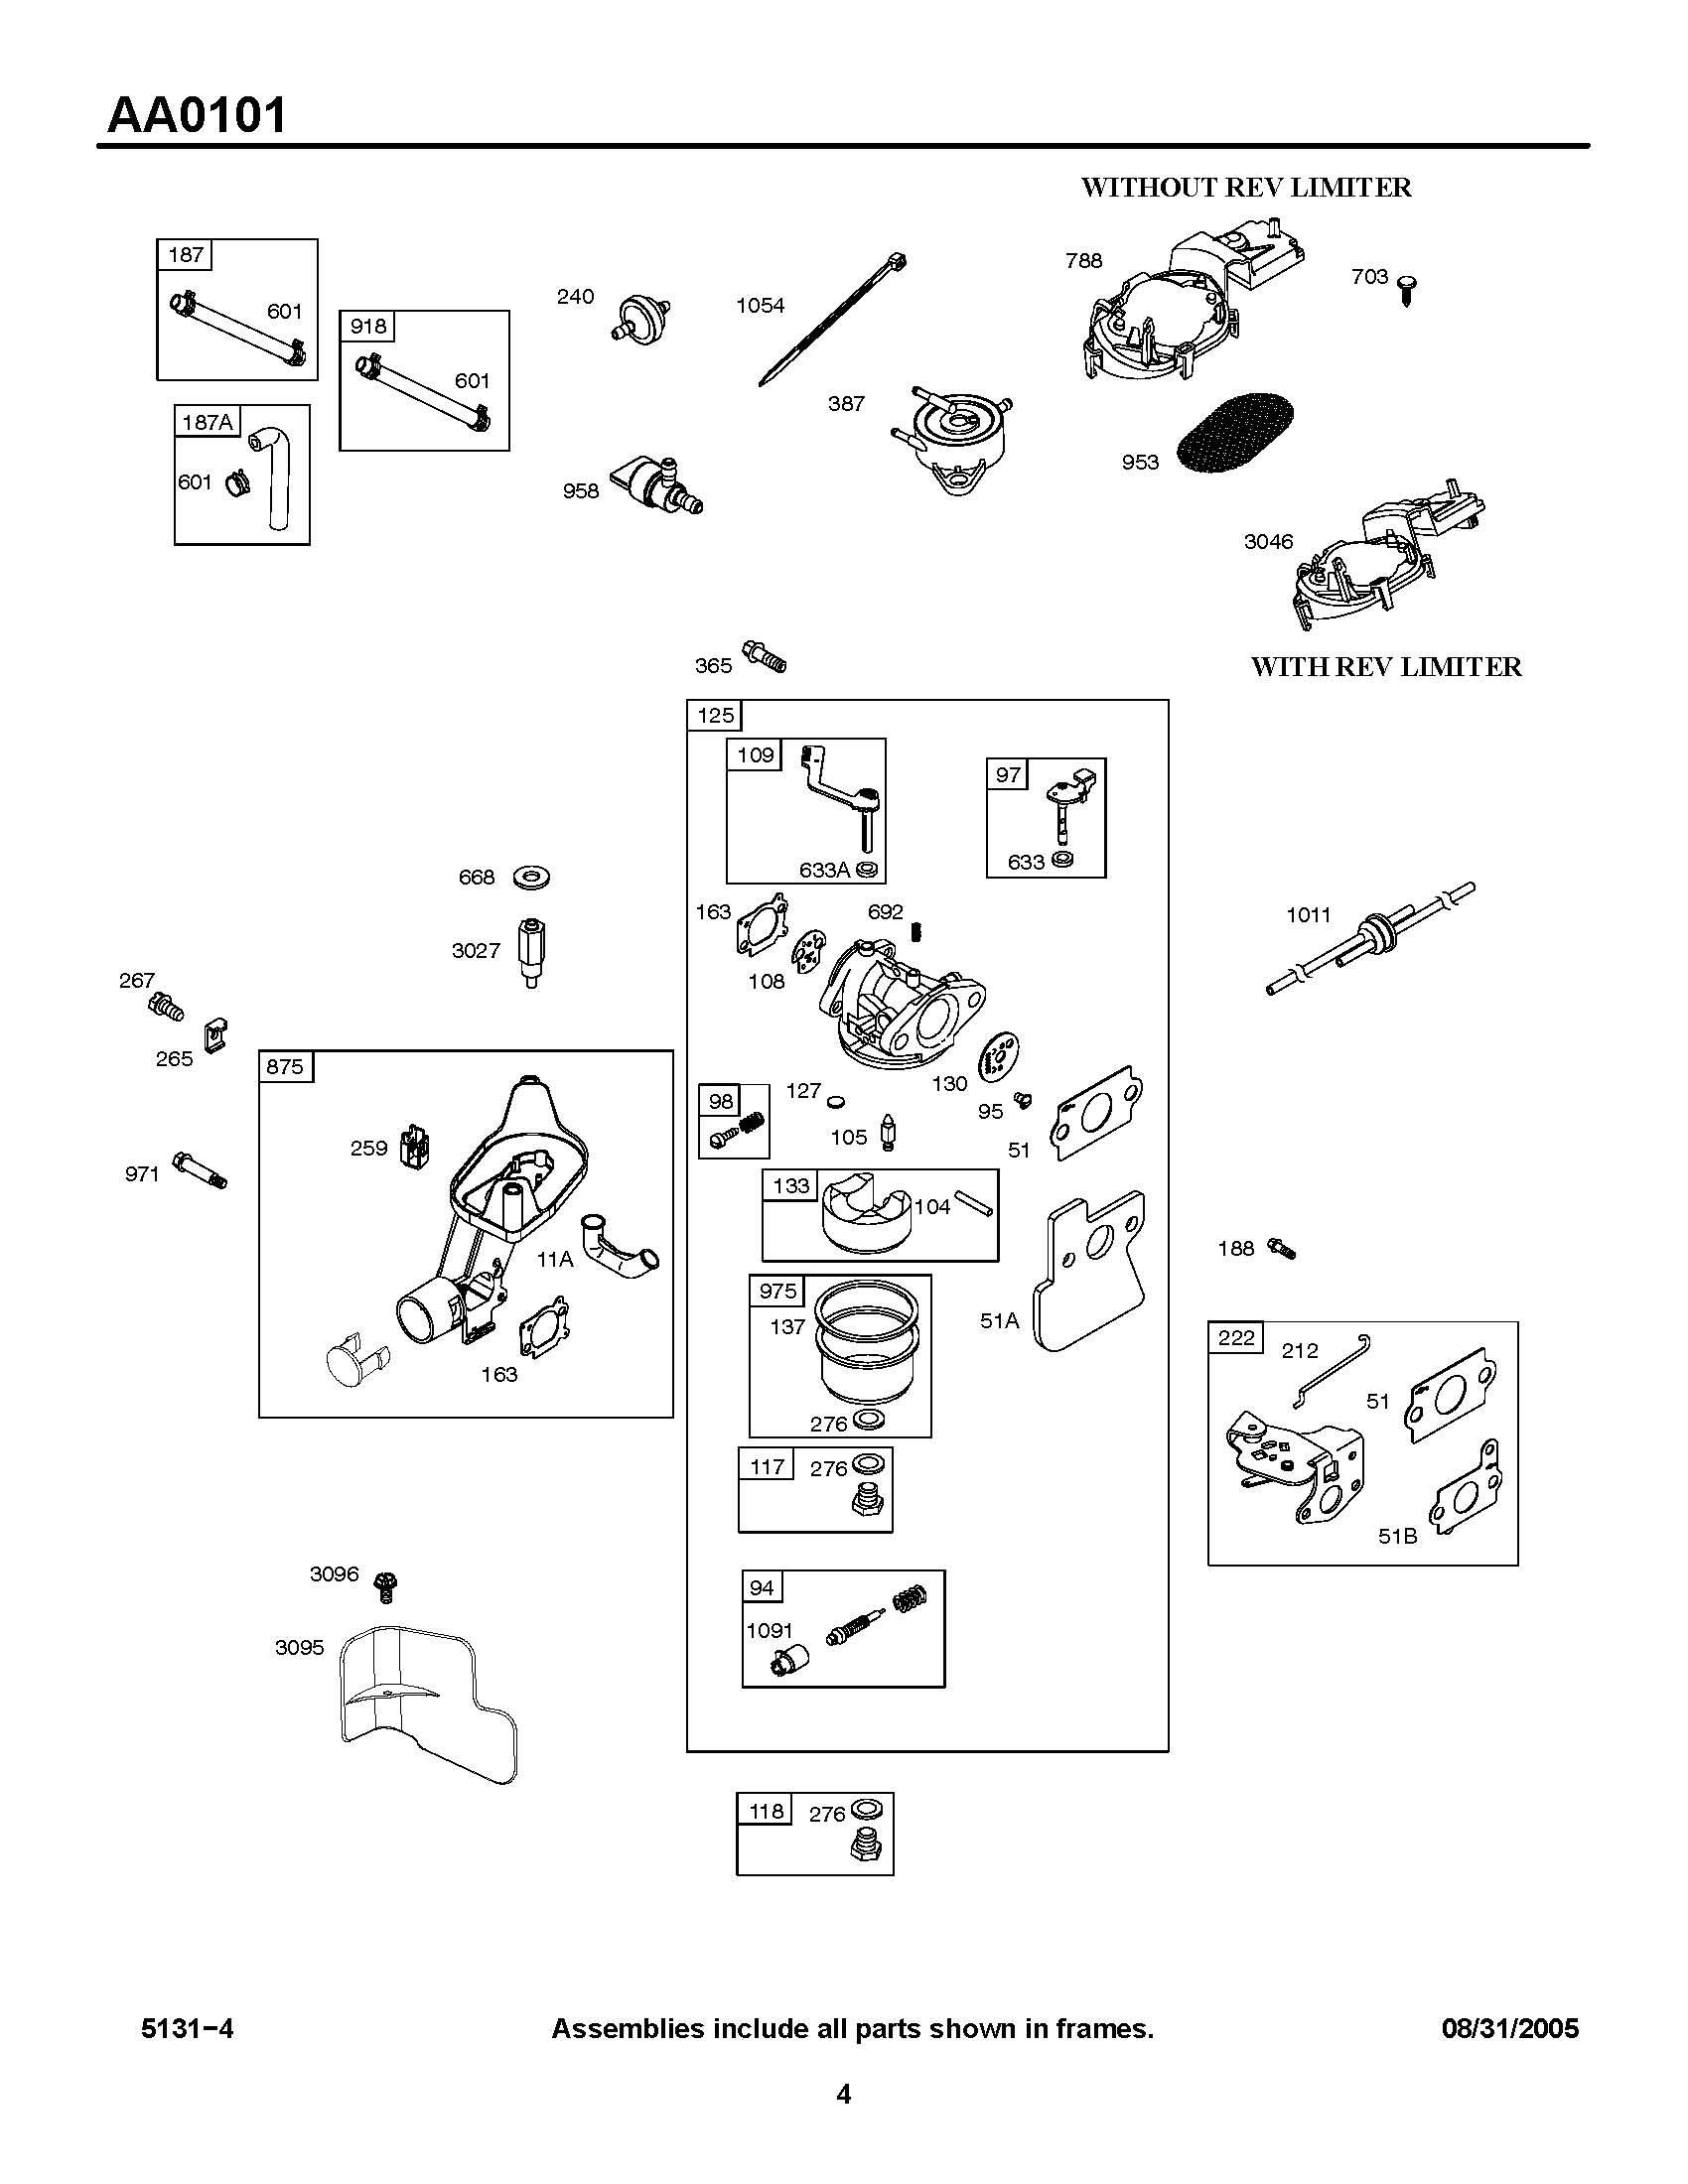 Briggs & Stratton 5hp Outboard Parts Manual